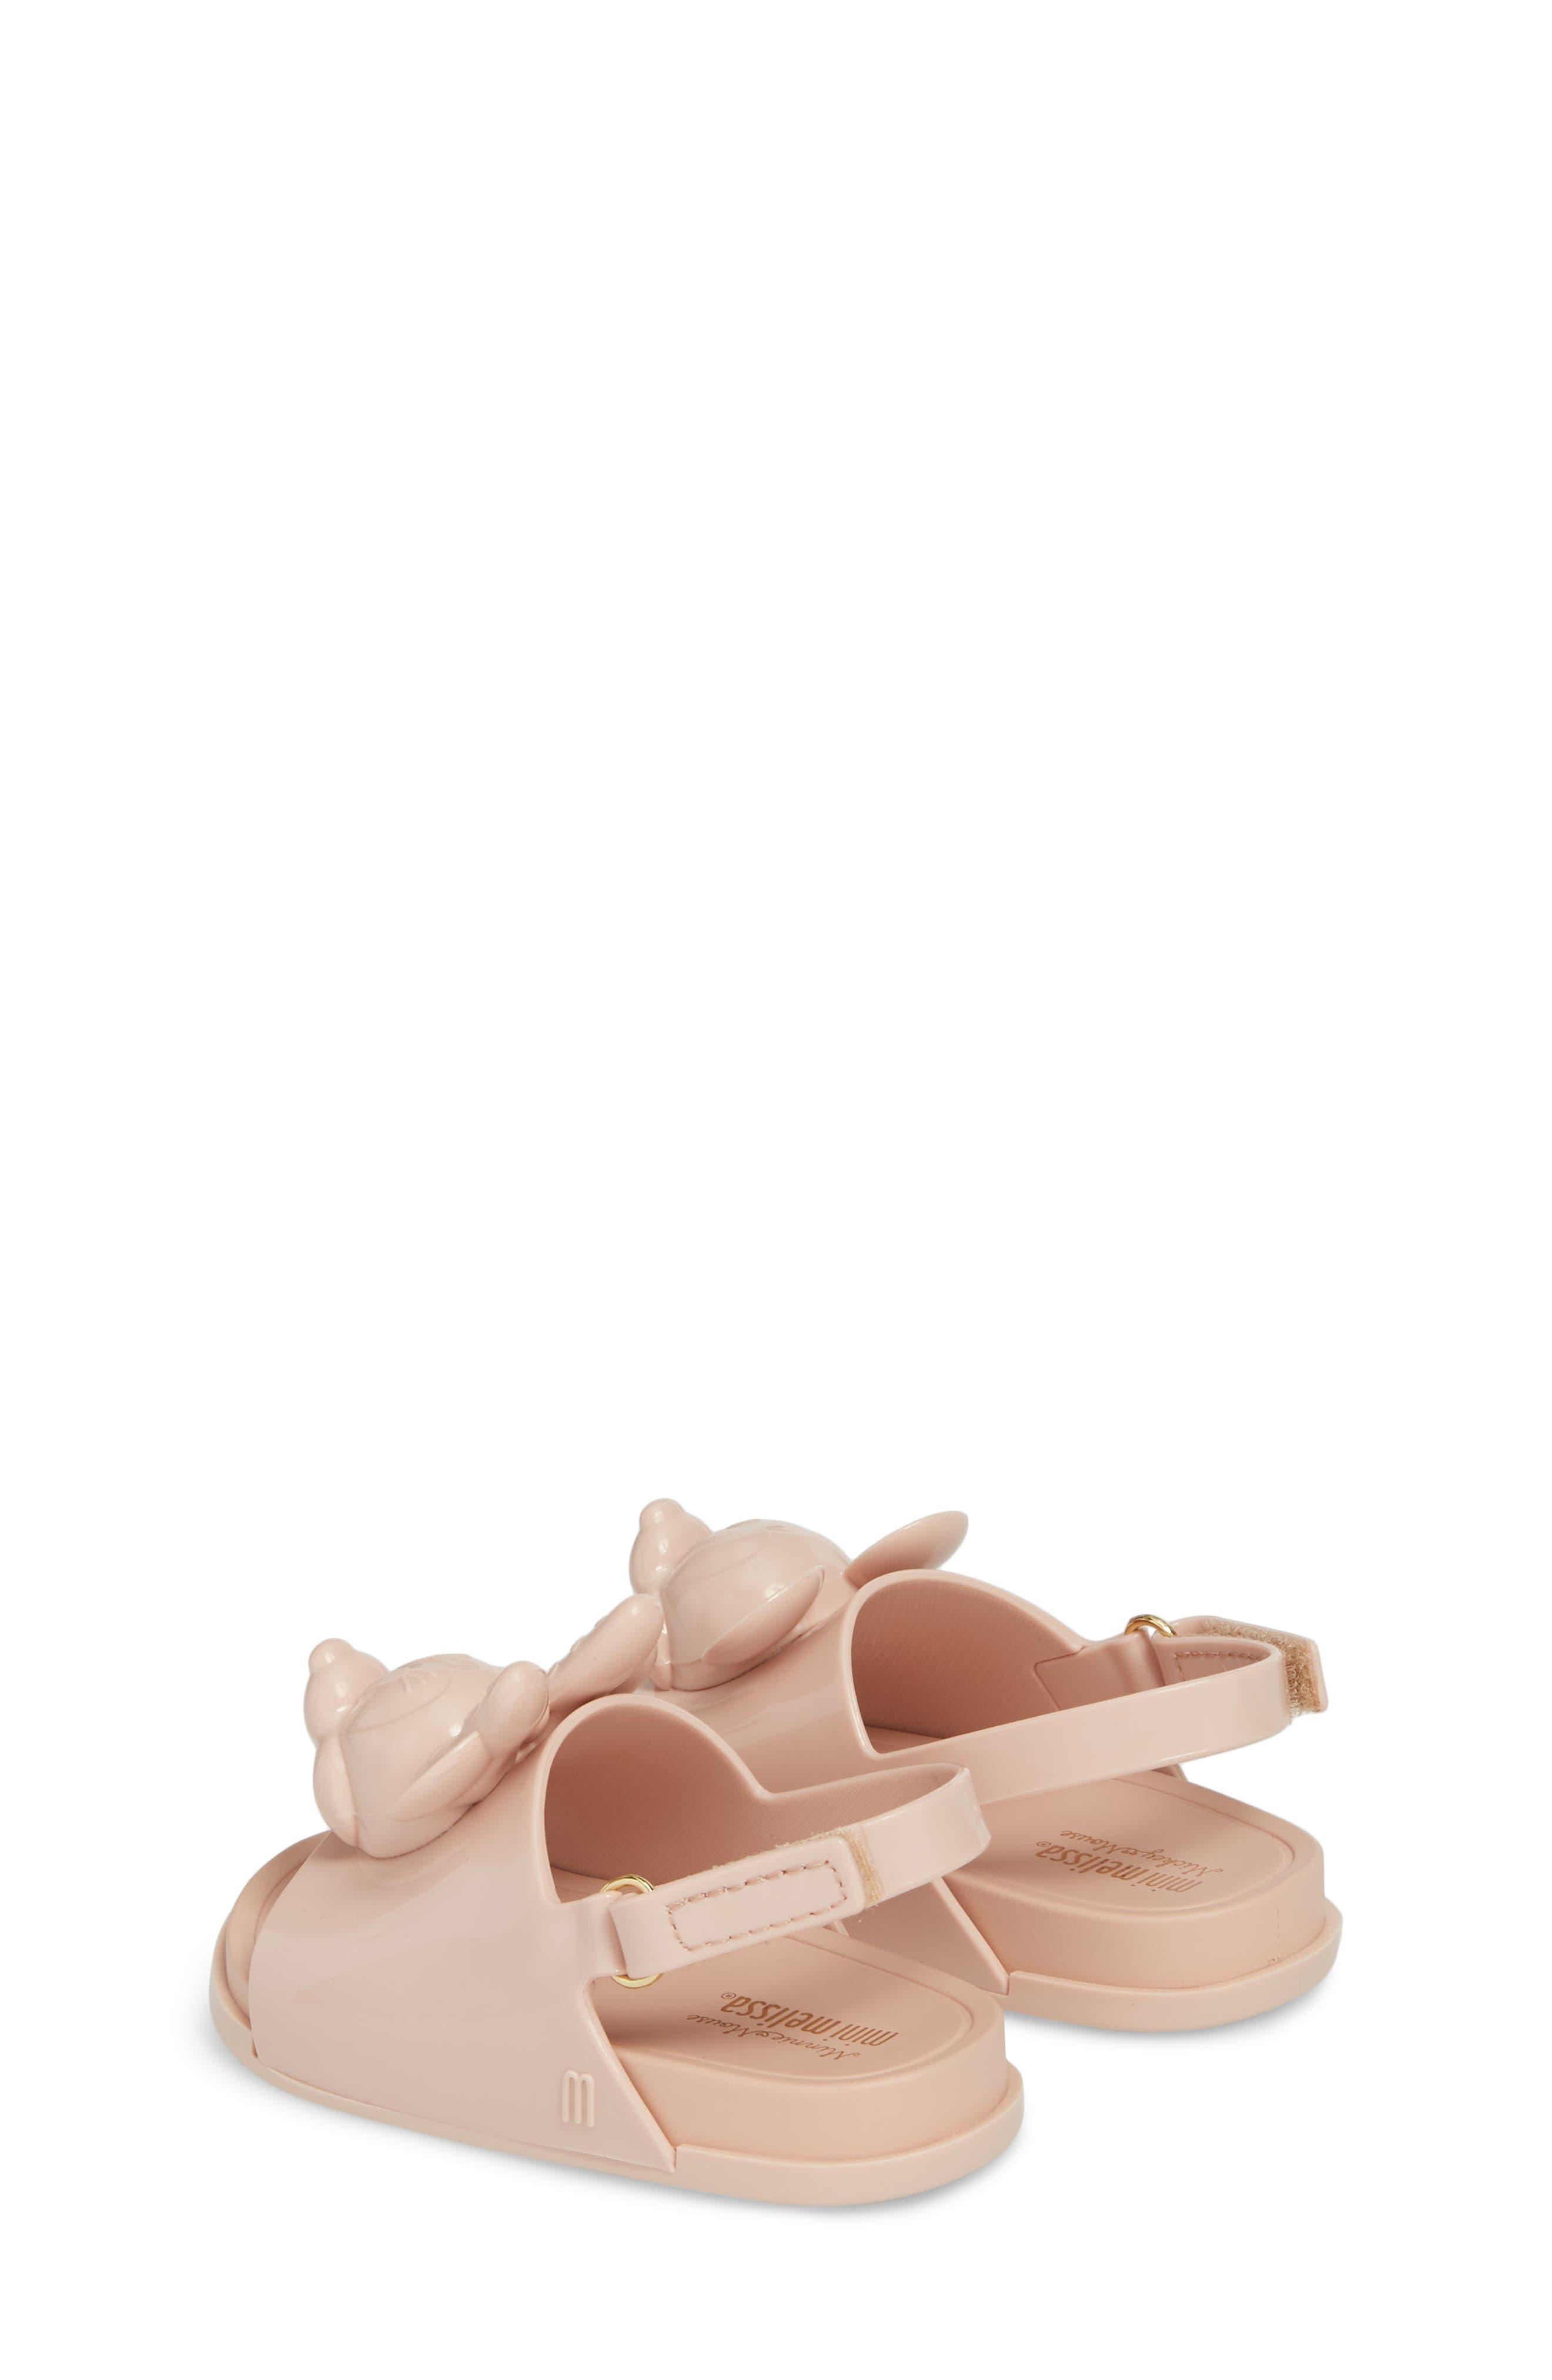 Disney<sup>®</sup> Mini Beach Sandal,                             Alternate thumbnail 8, color,